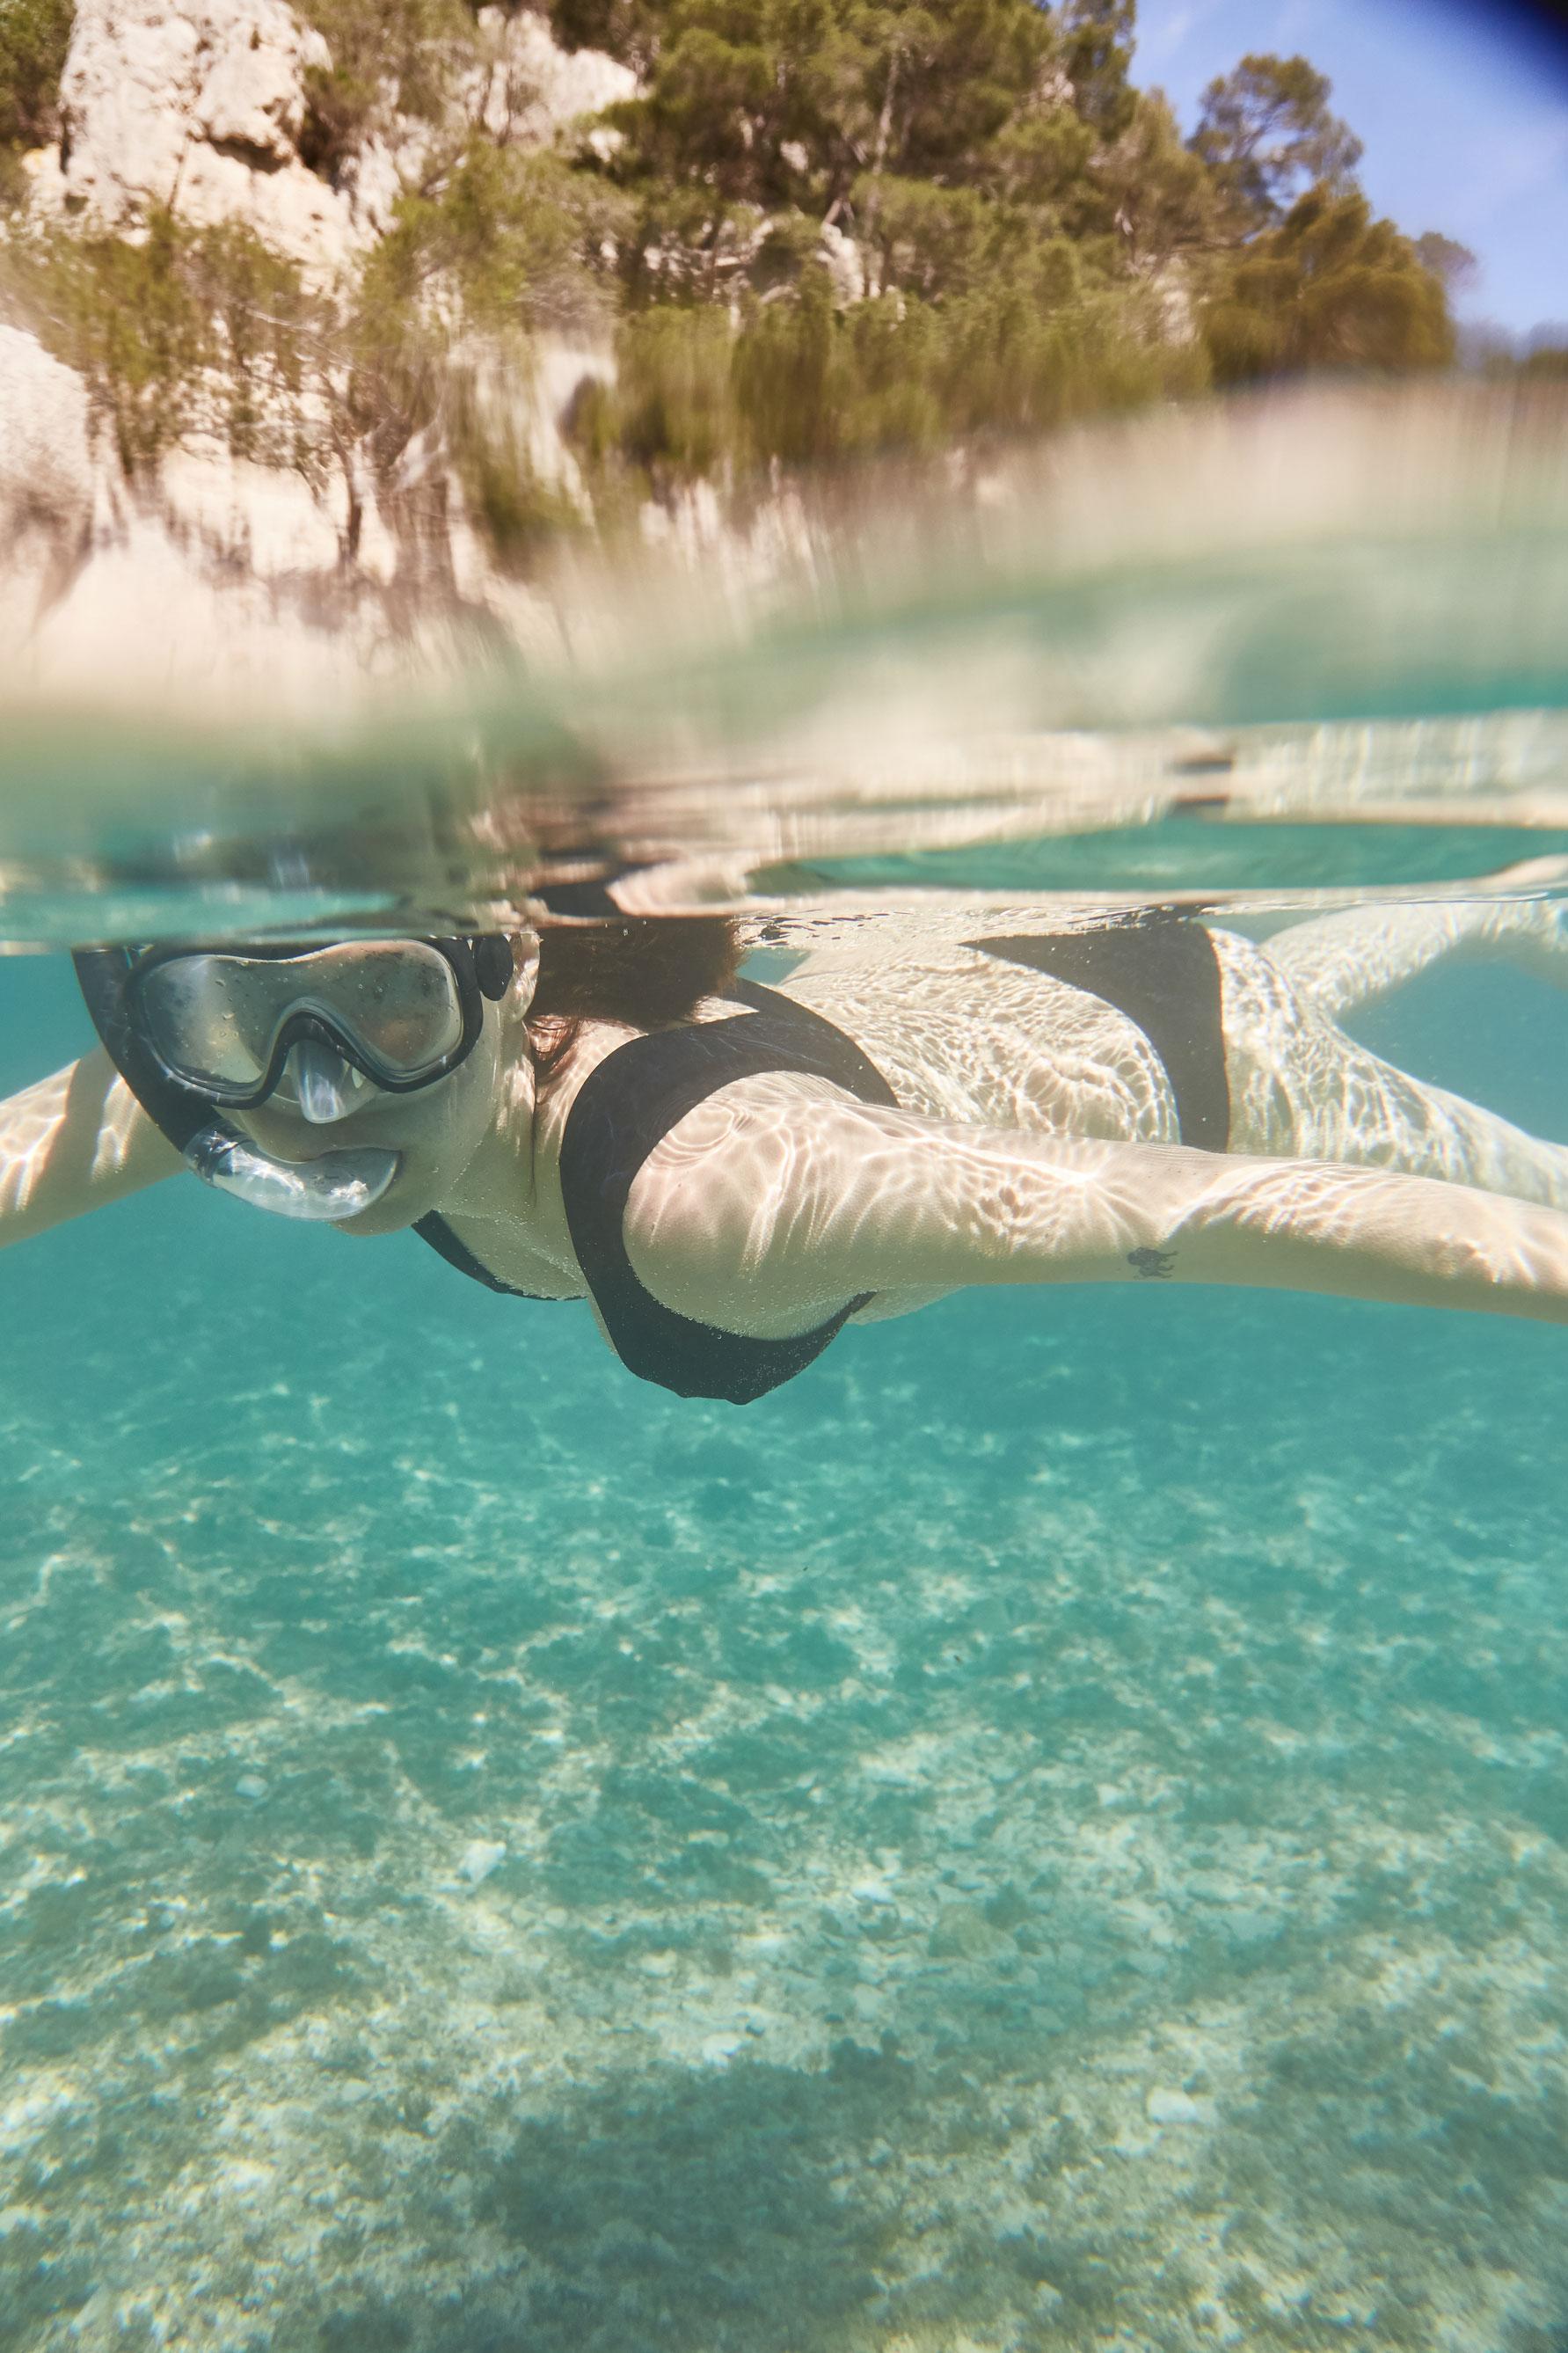 photographe voyage aventure outdoor